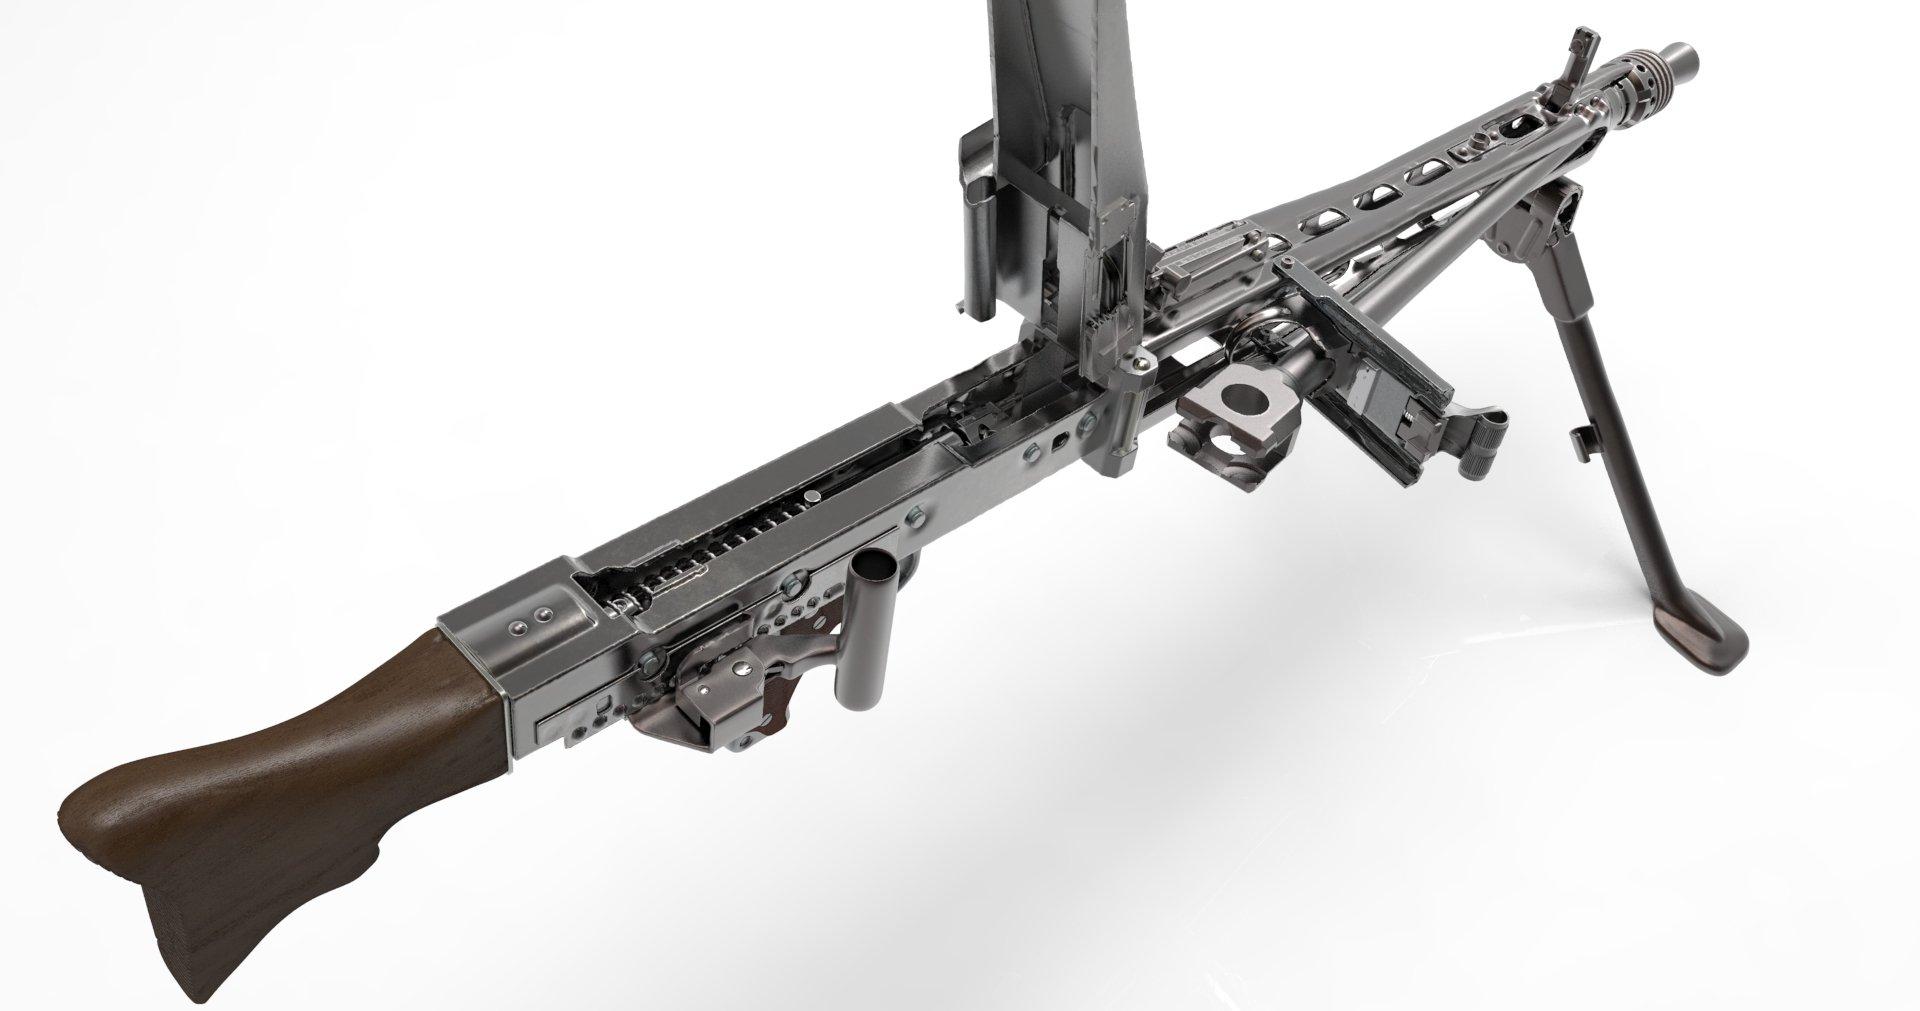 MG42 Machine Gun Weapon Military Germany Ww2 Wwll 26 Wallpaper